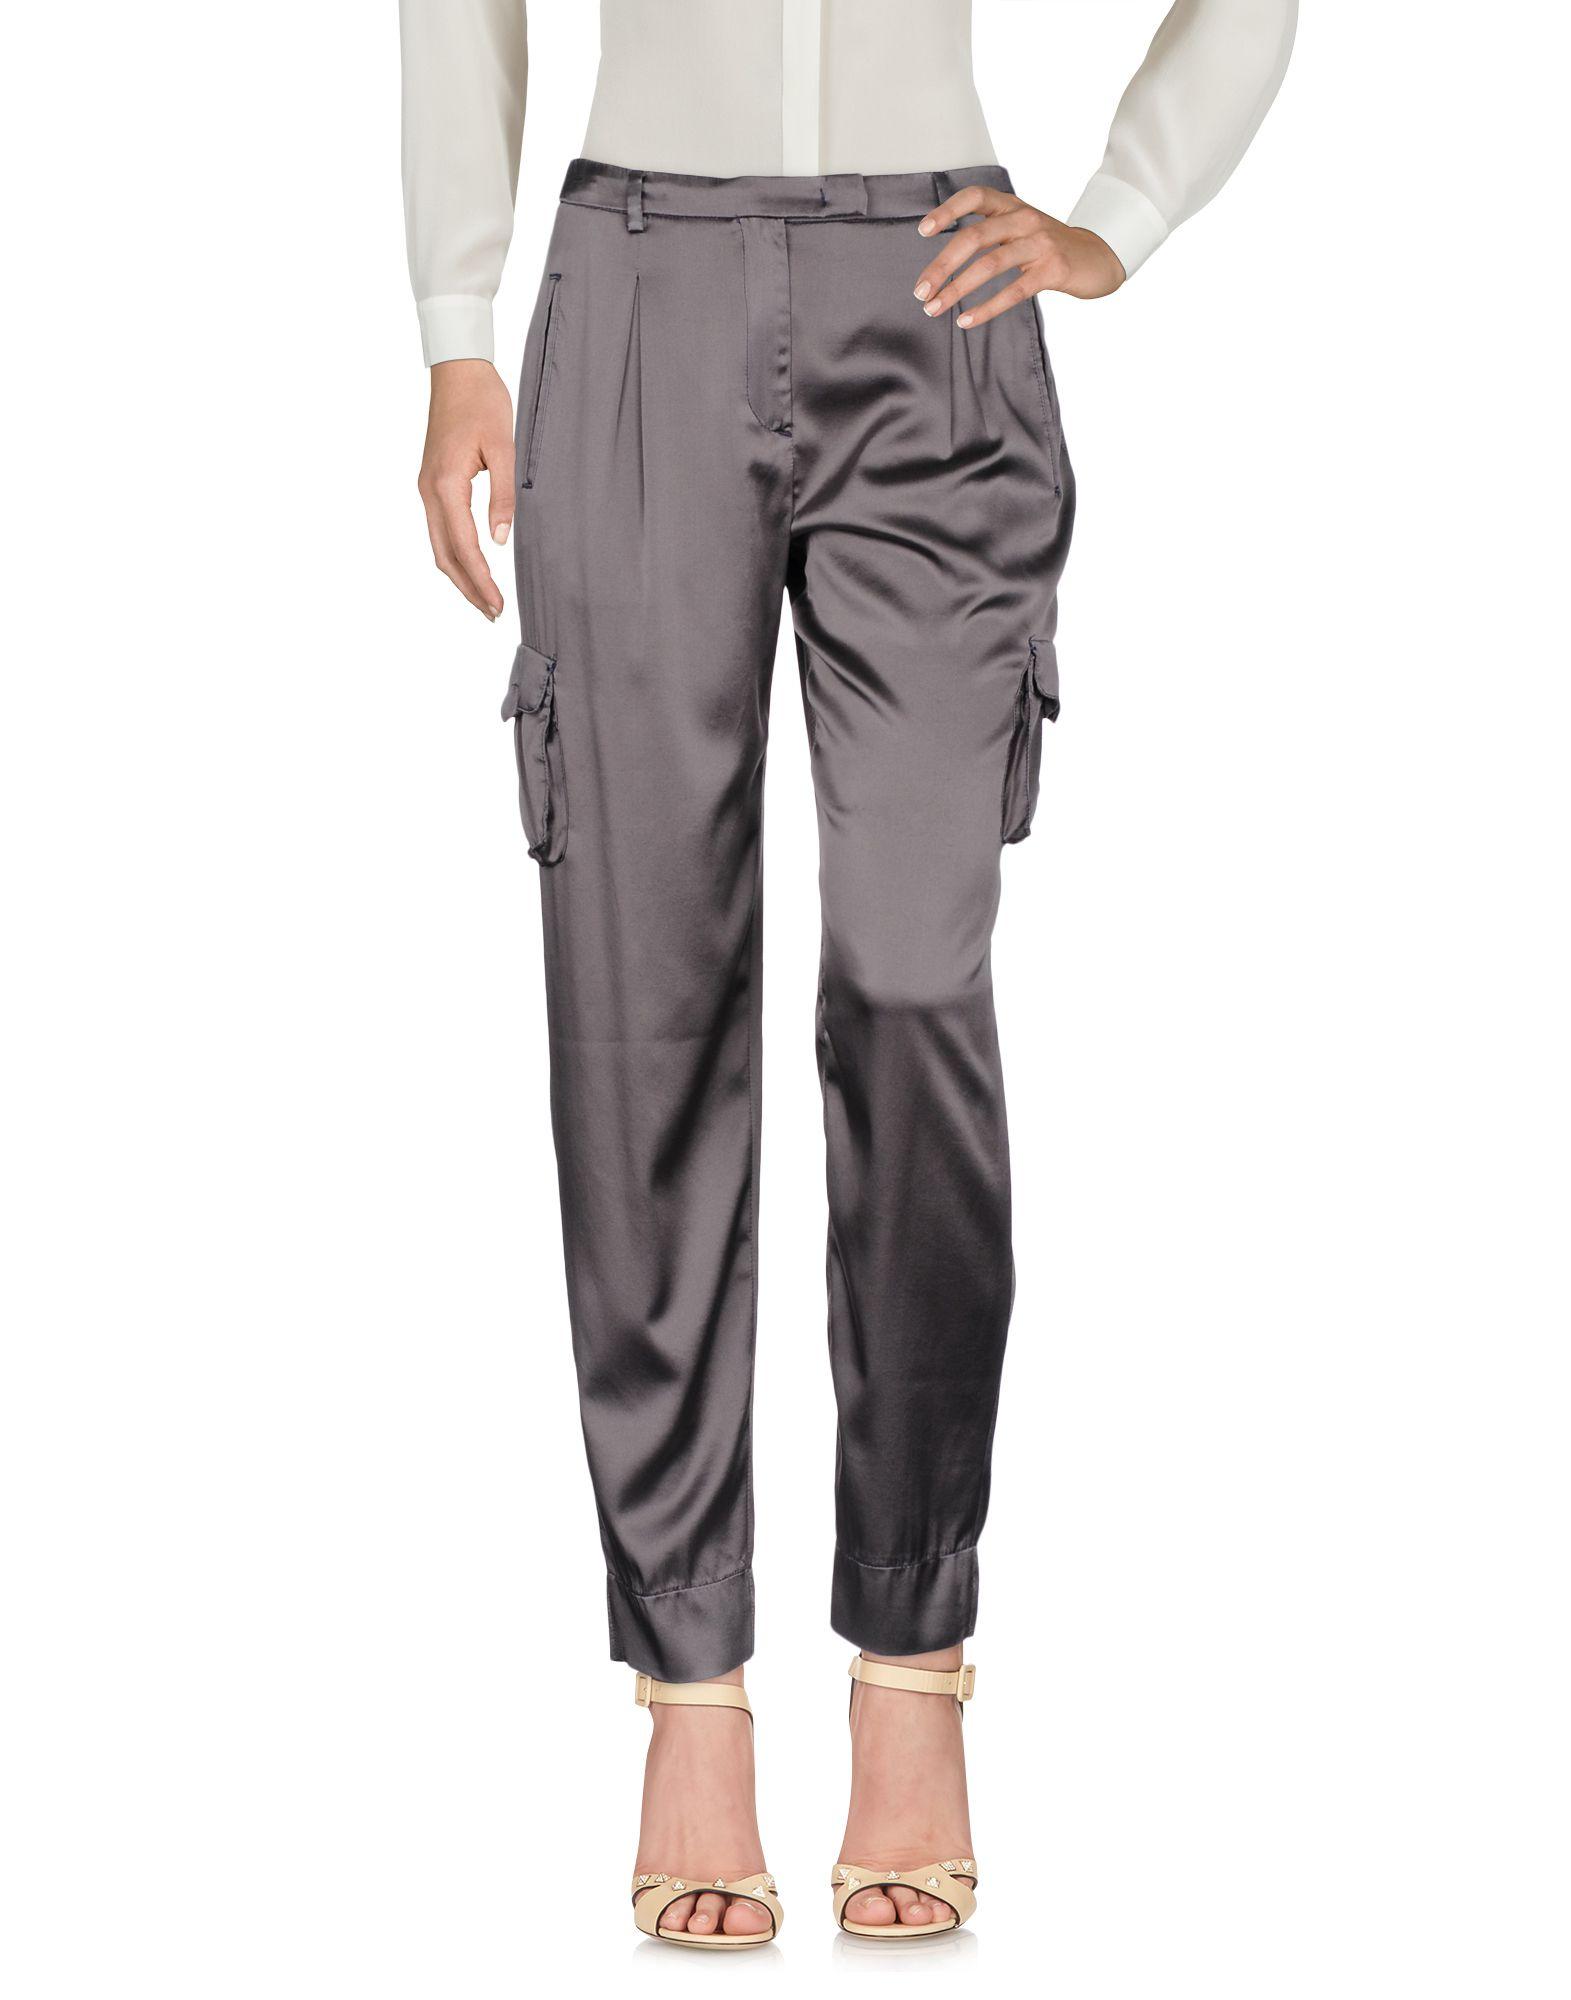 Pantalone Incotex Donna - Acquista online su 0TFiyM